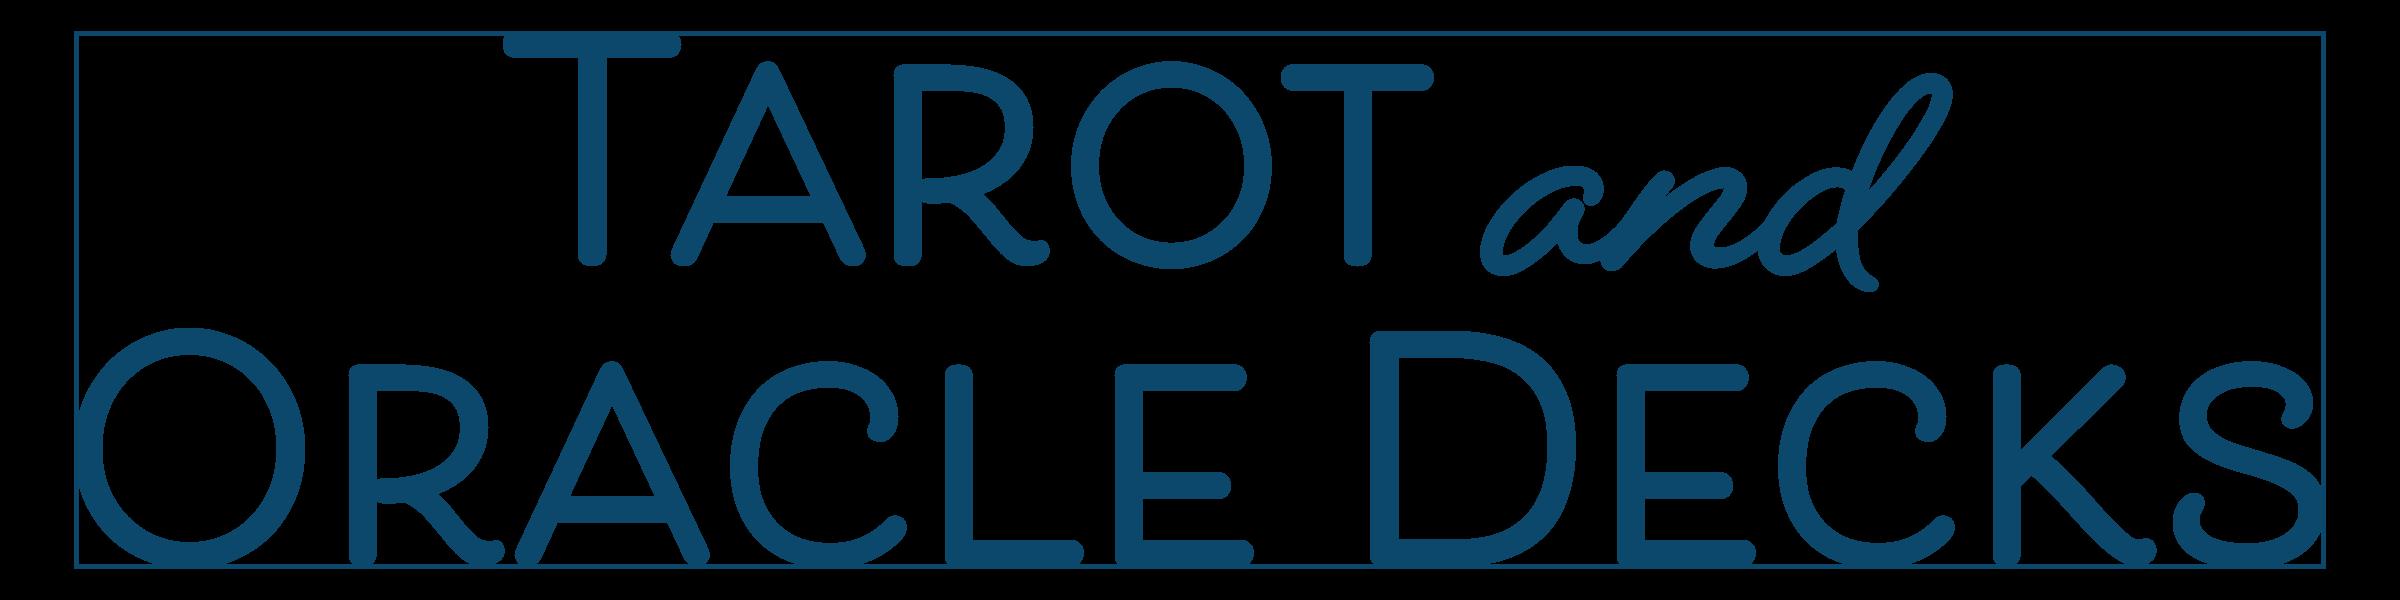 Tarot and Oracle Decks